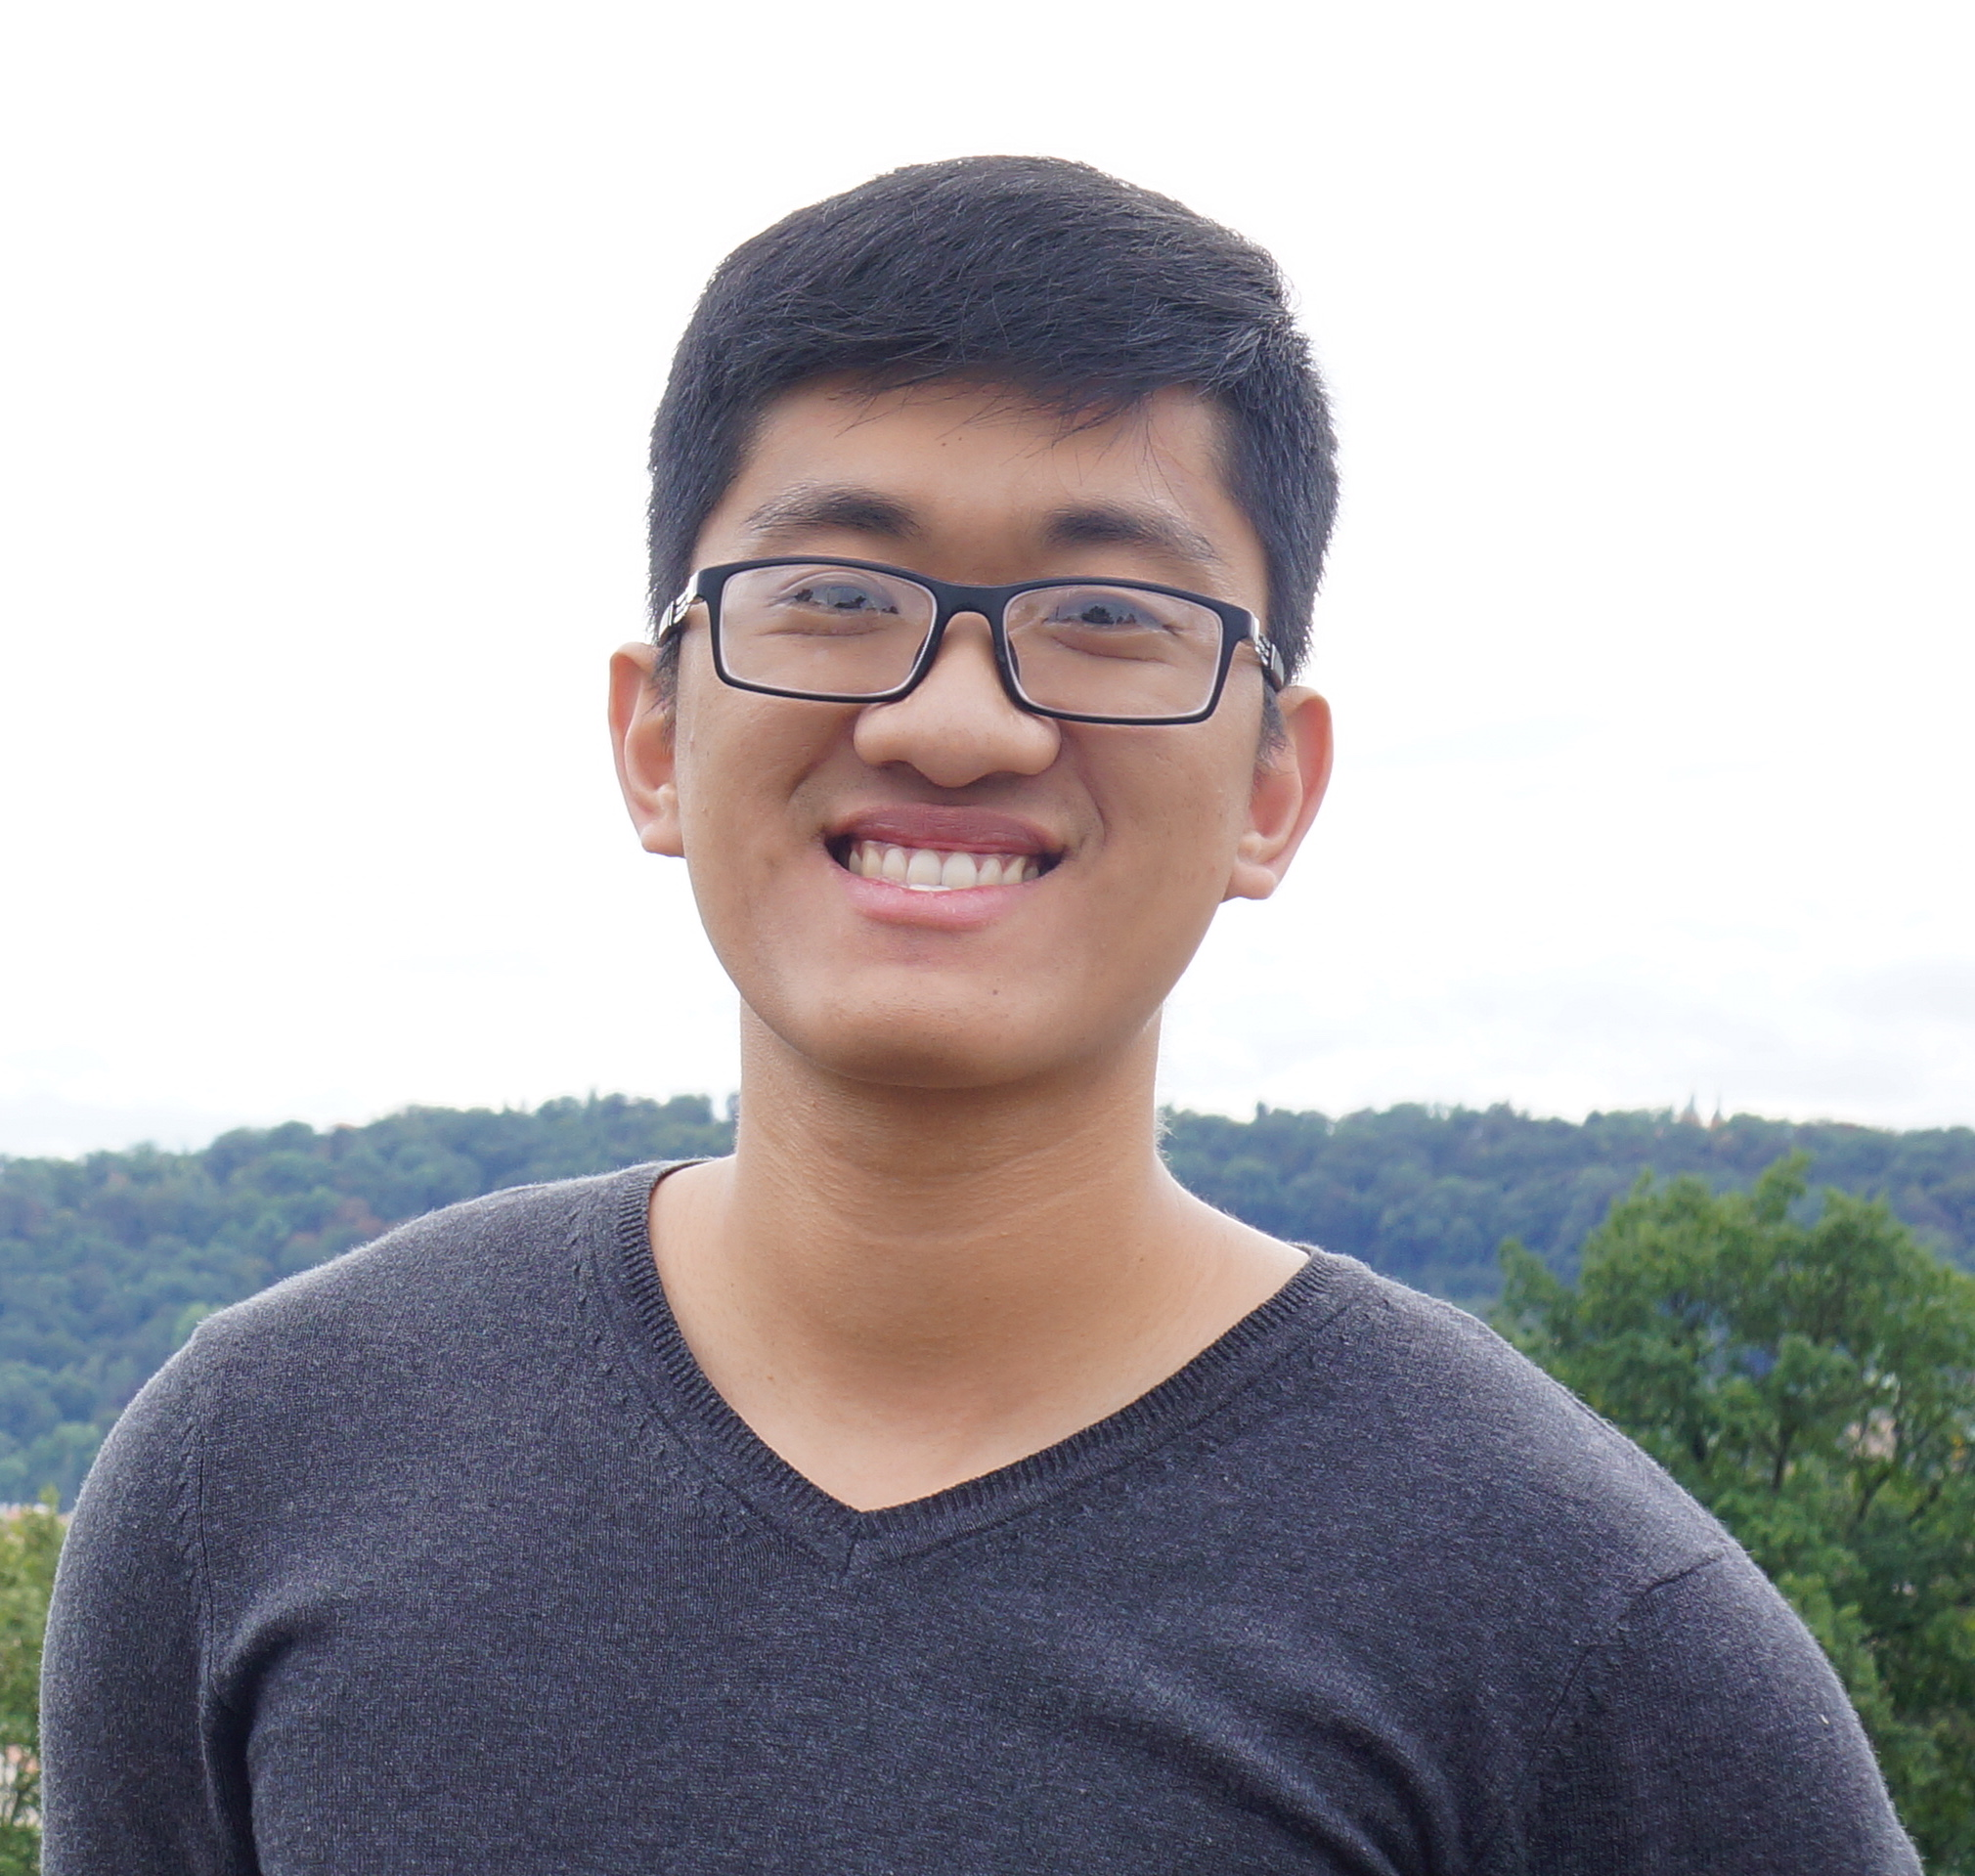 Trung Nghia Vo